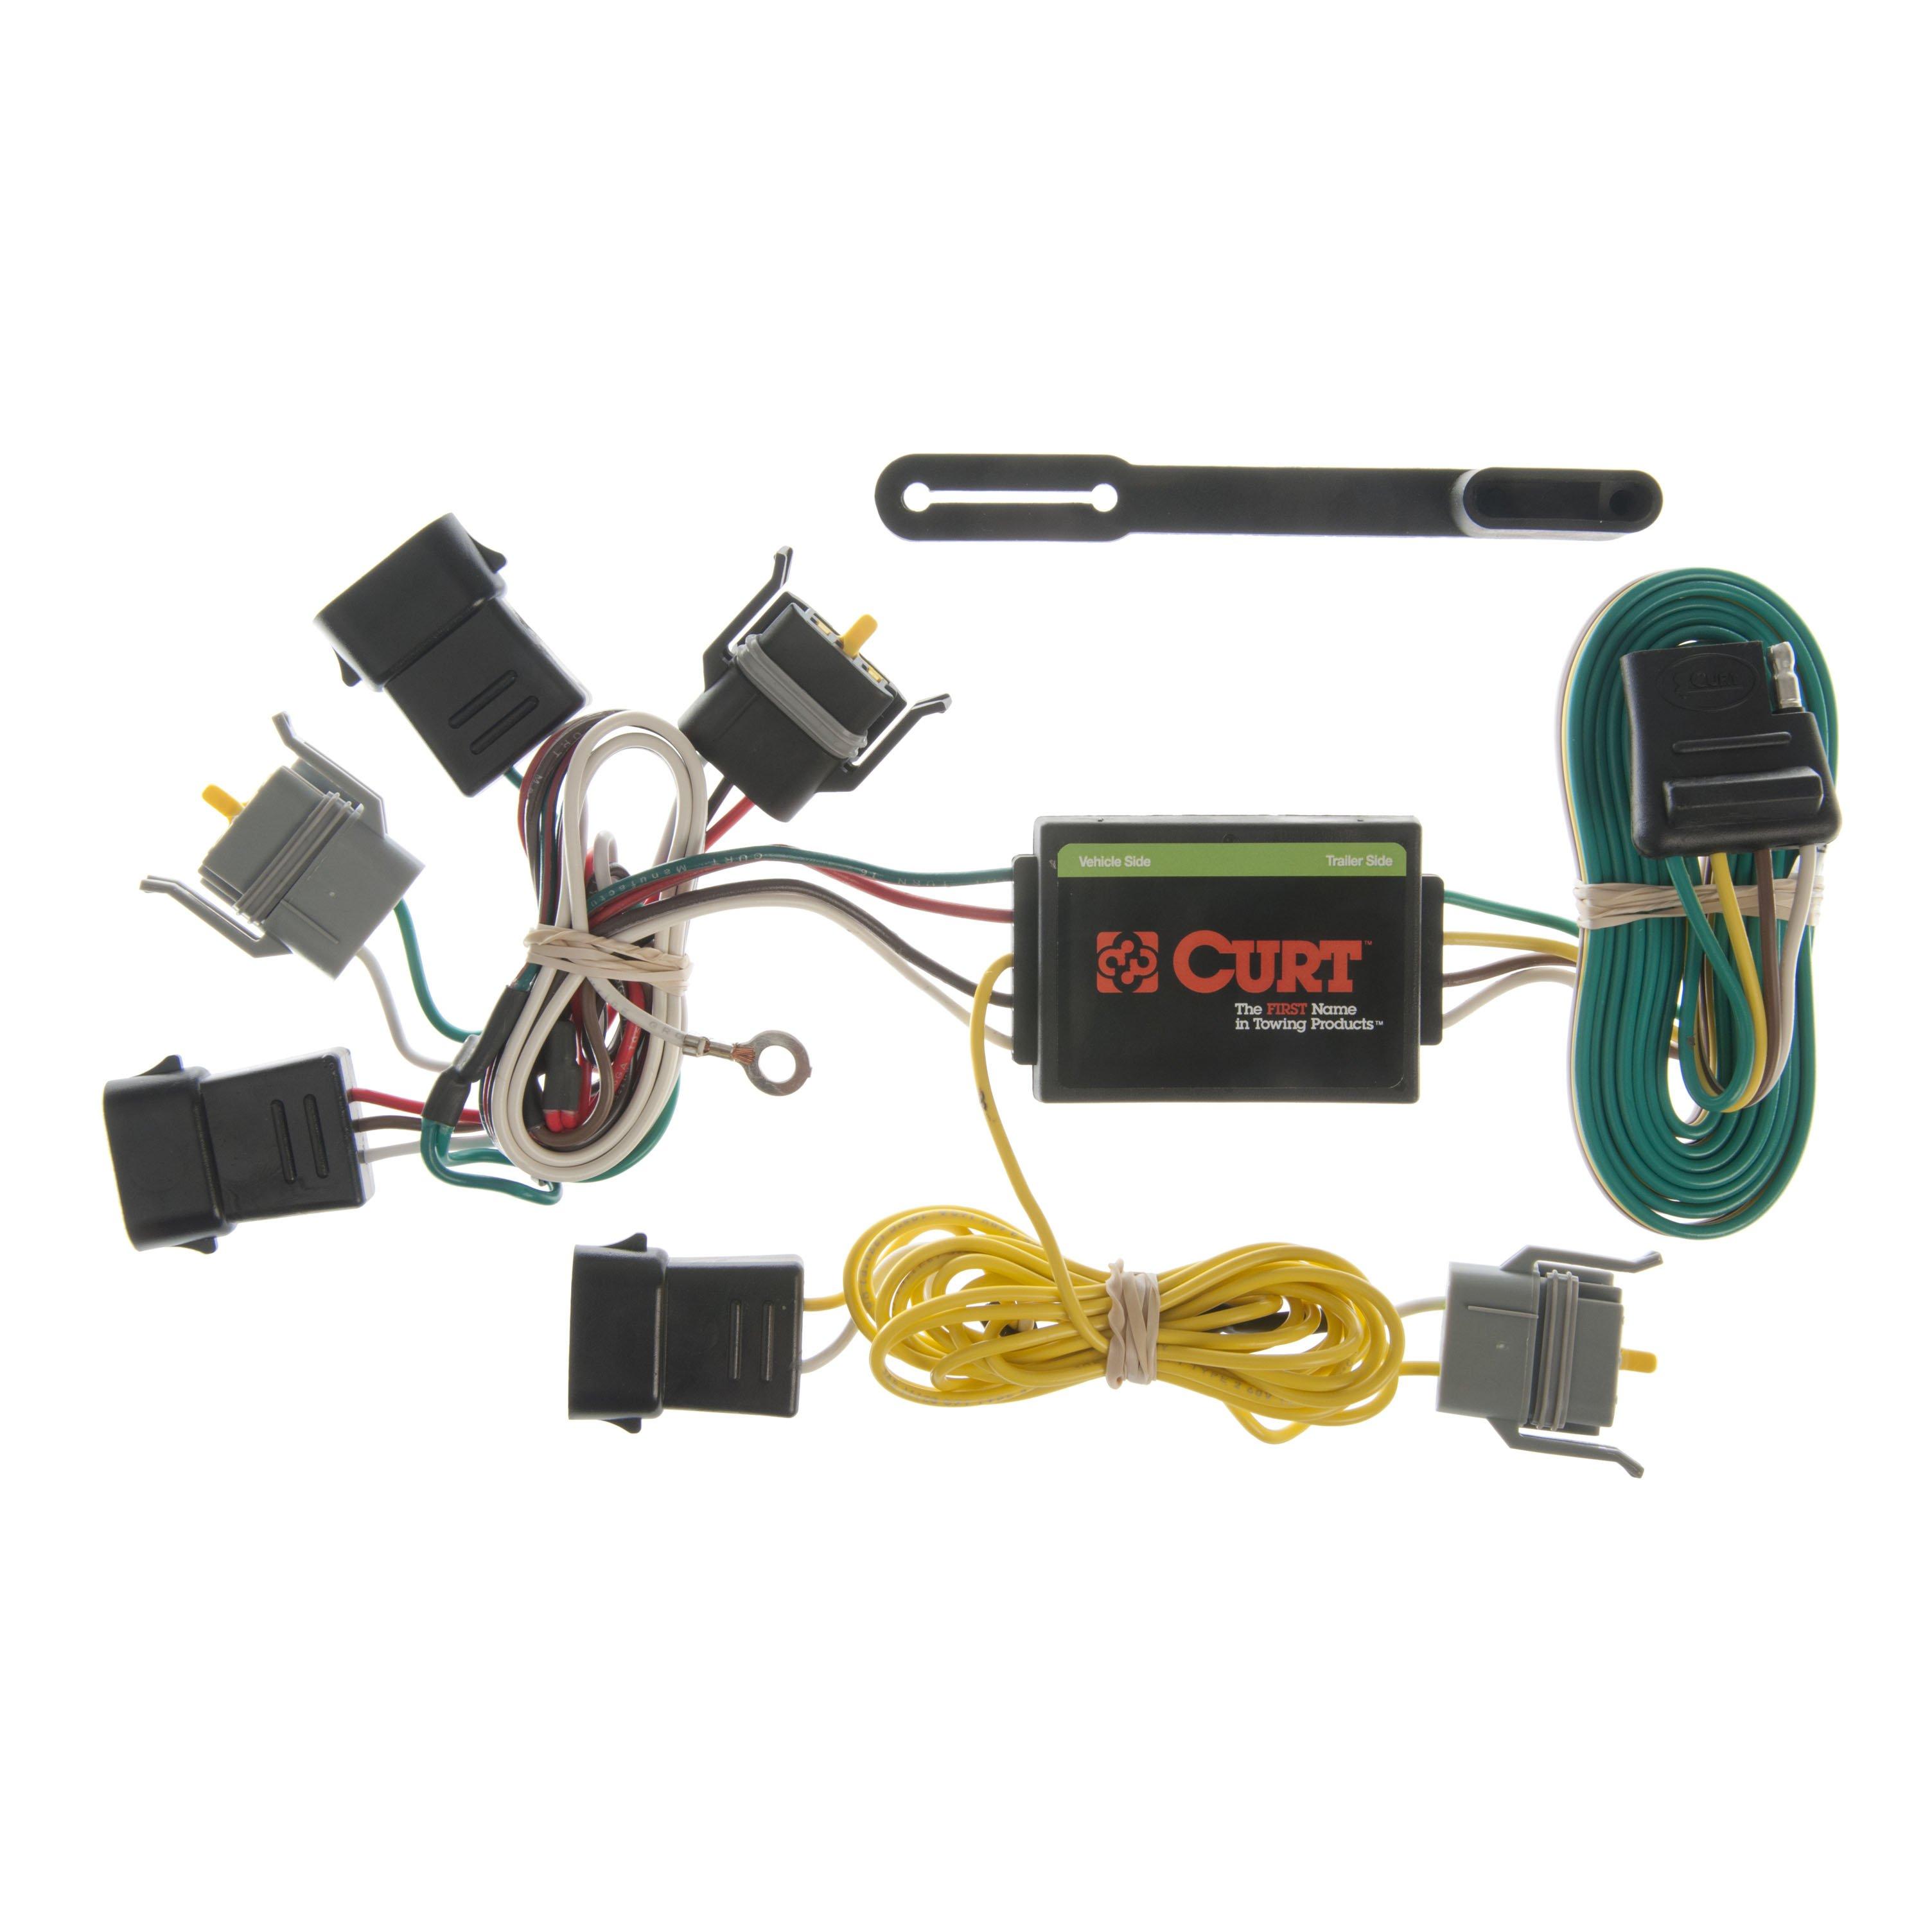 CURT 55343 Wiring for Ford E-Series Van, Escape, Mazda Tribute, Mercury  Sable